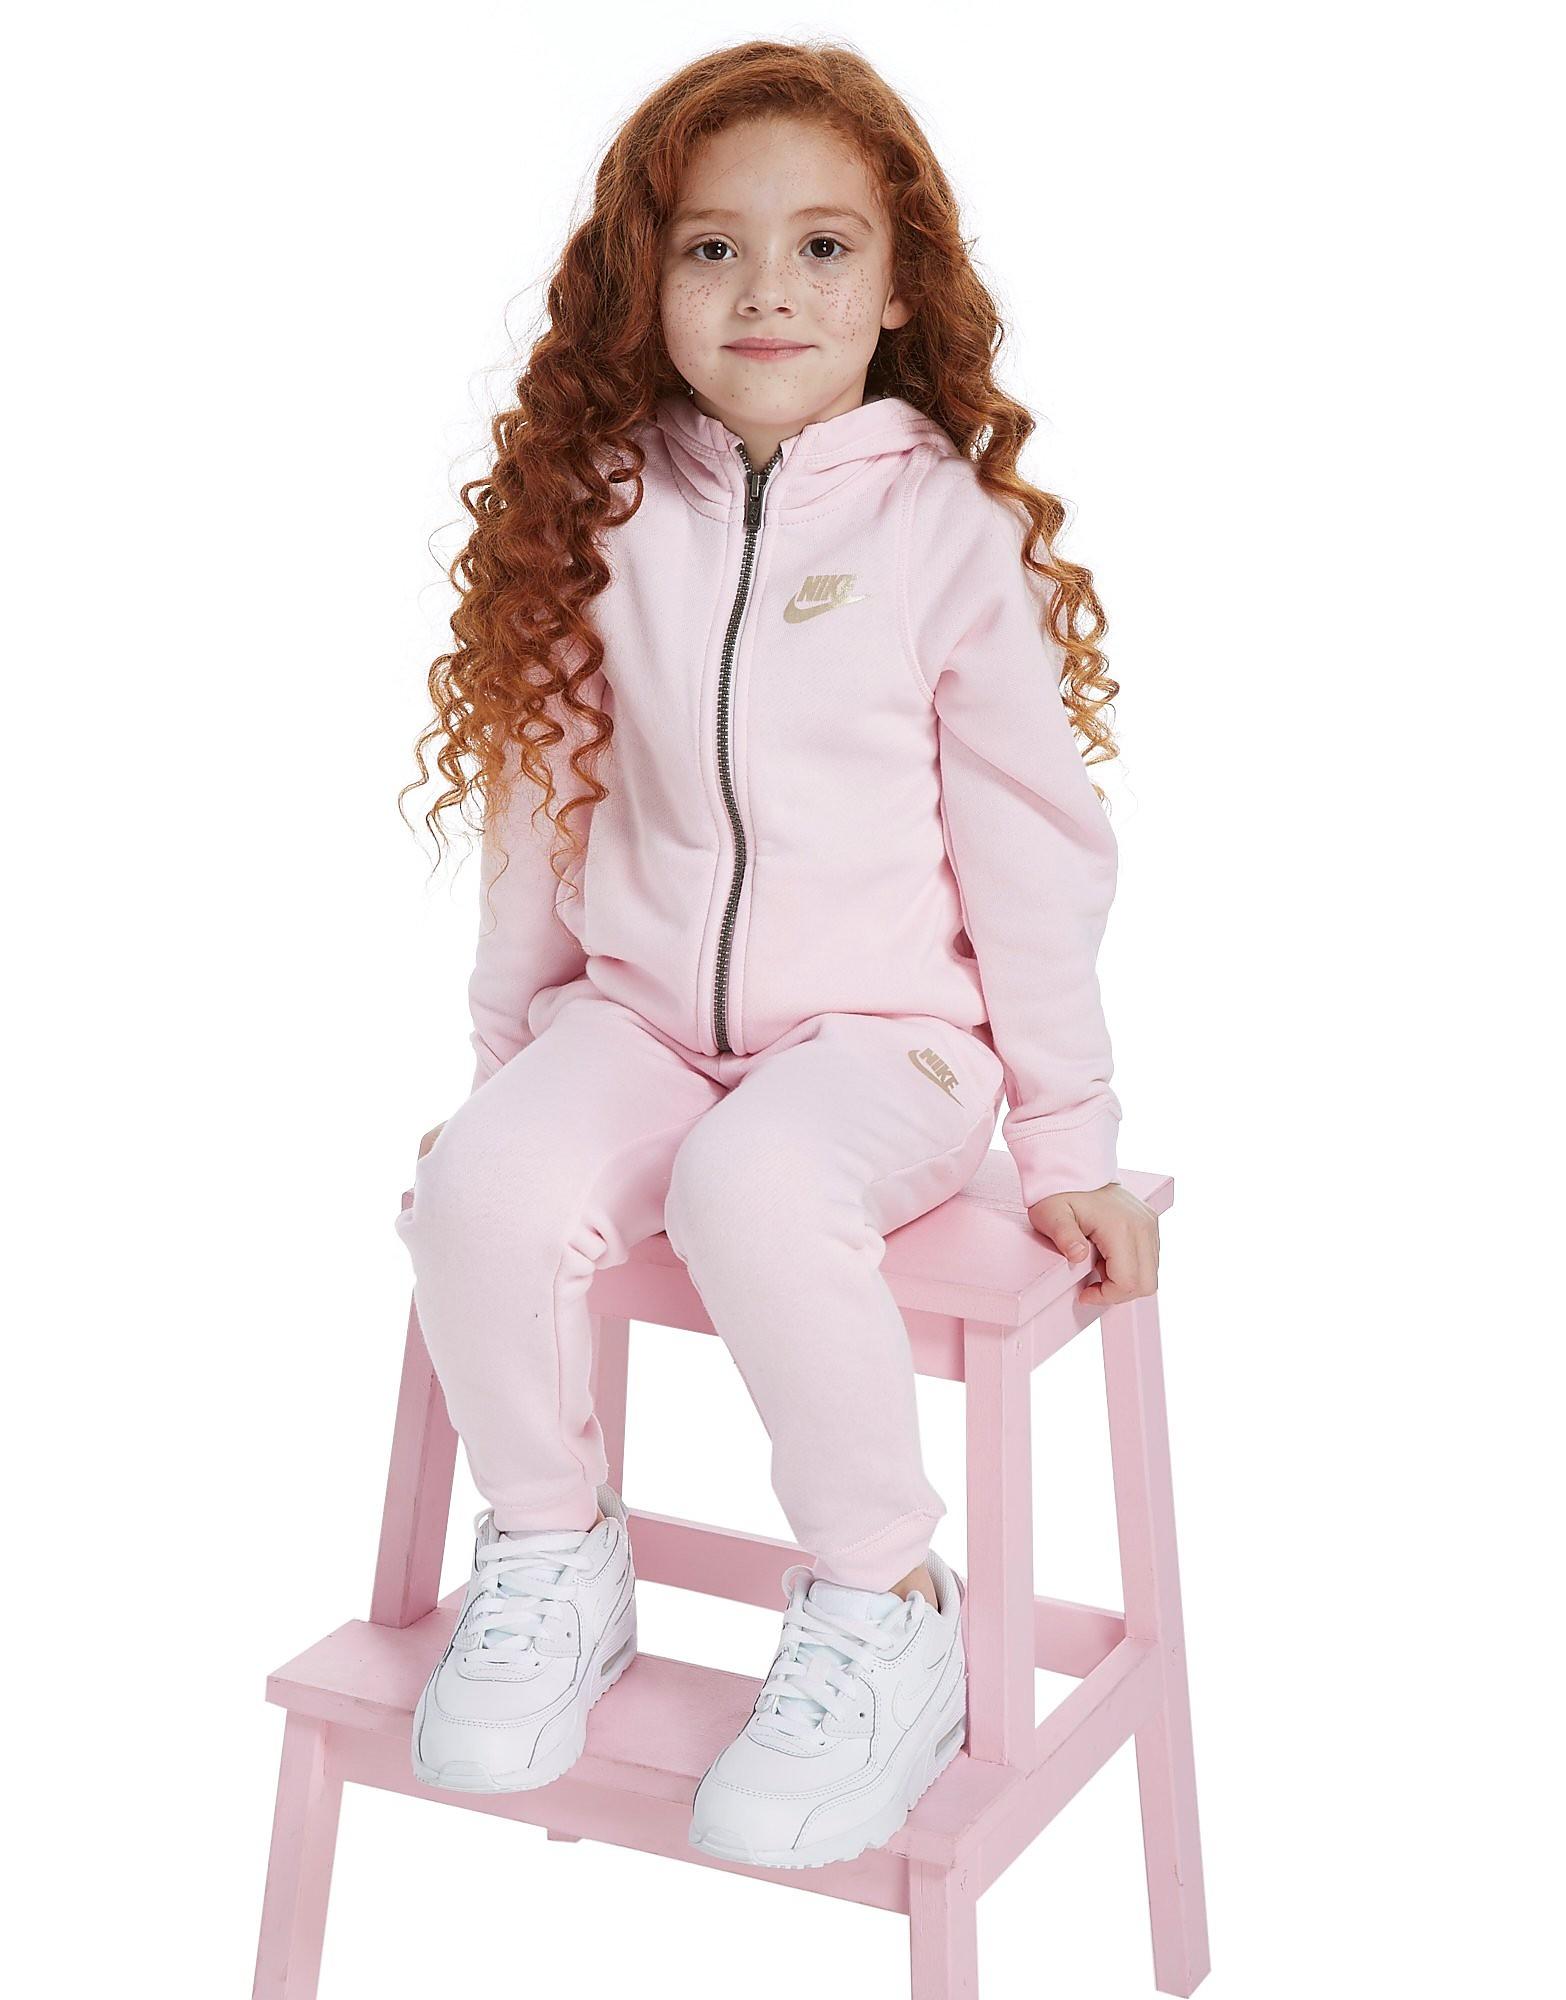 Nike Survêtement Girls' Modern Enfant